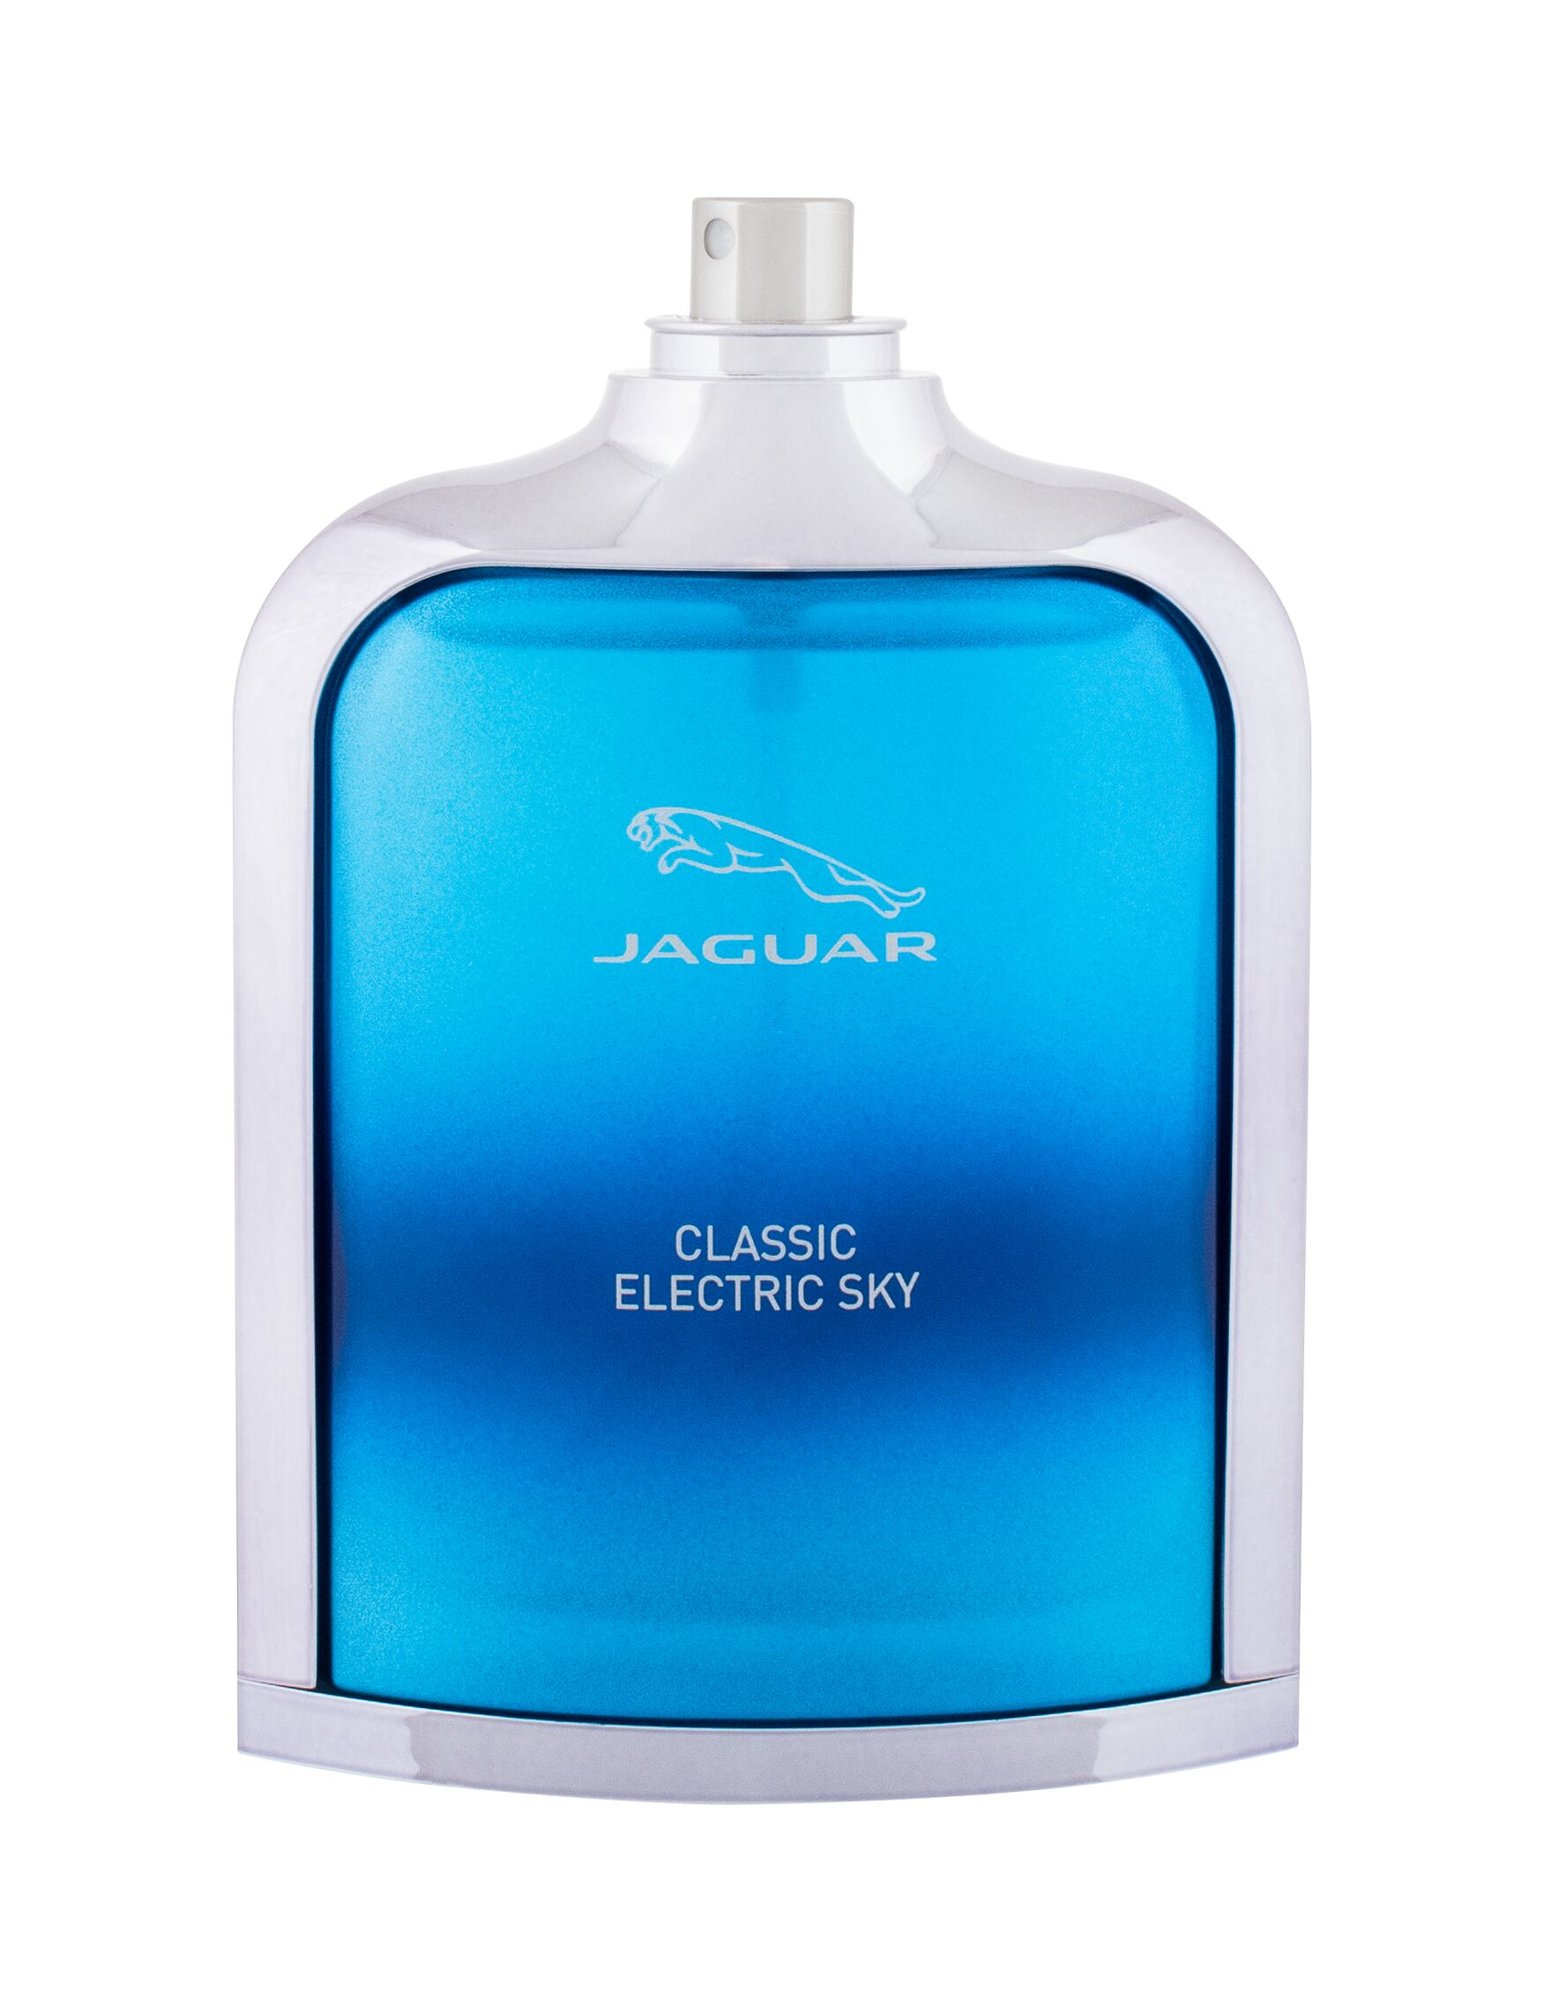 Jaguar Classic Electric Sky, Toaletní voda 100ml, Tester